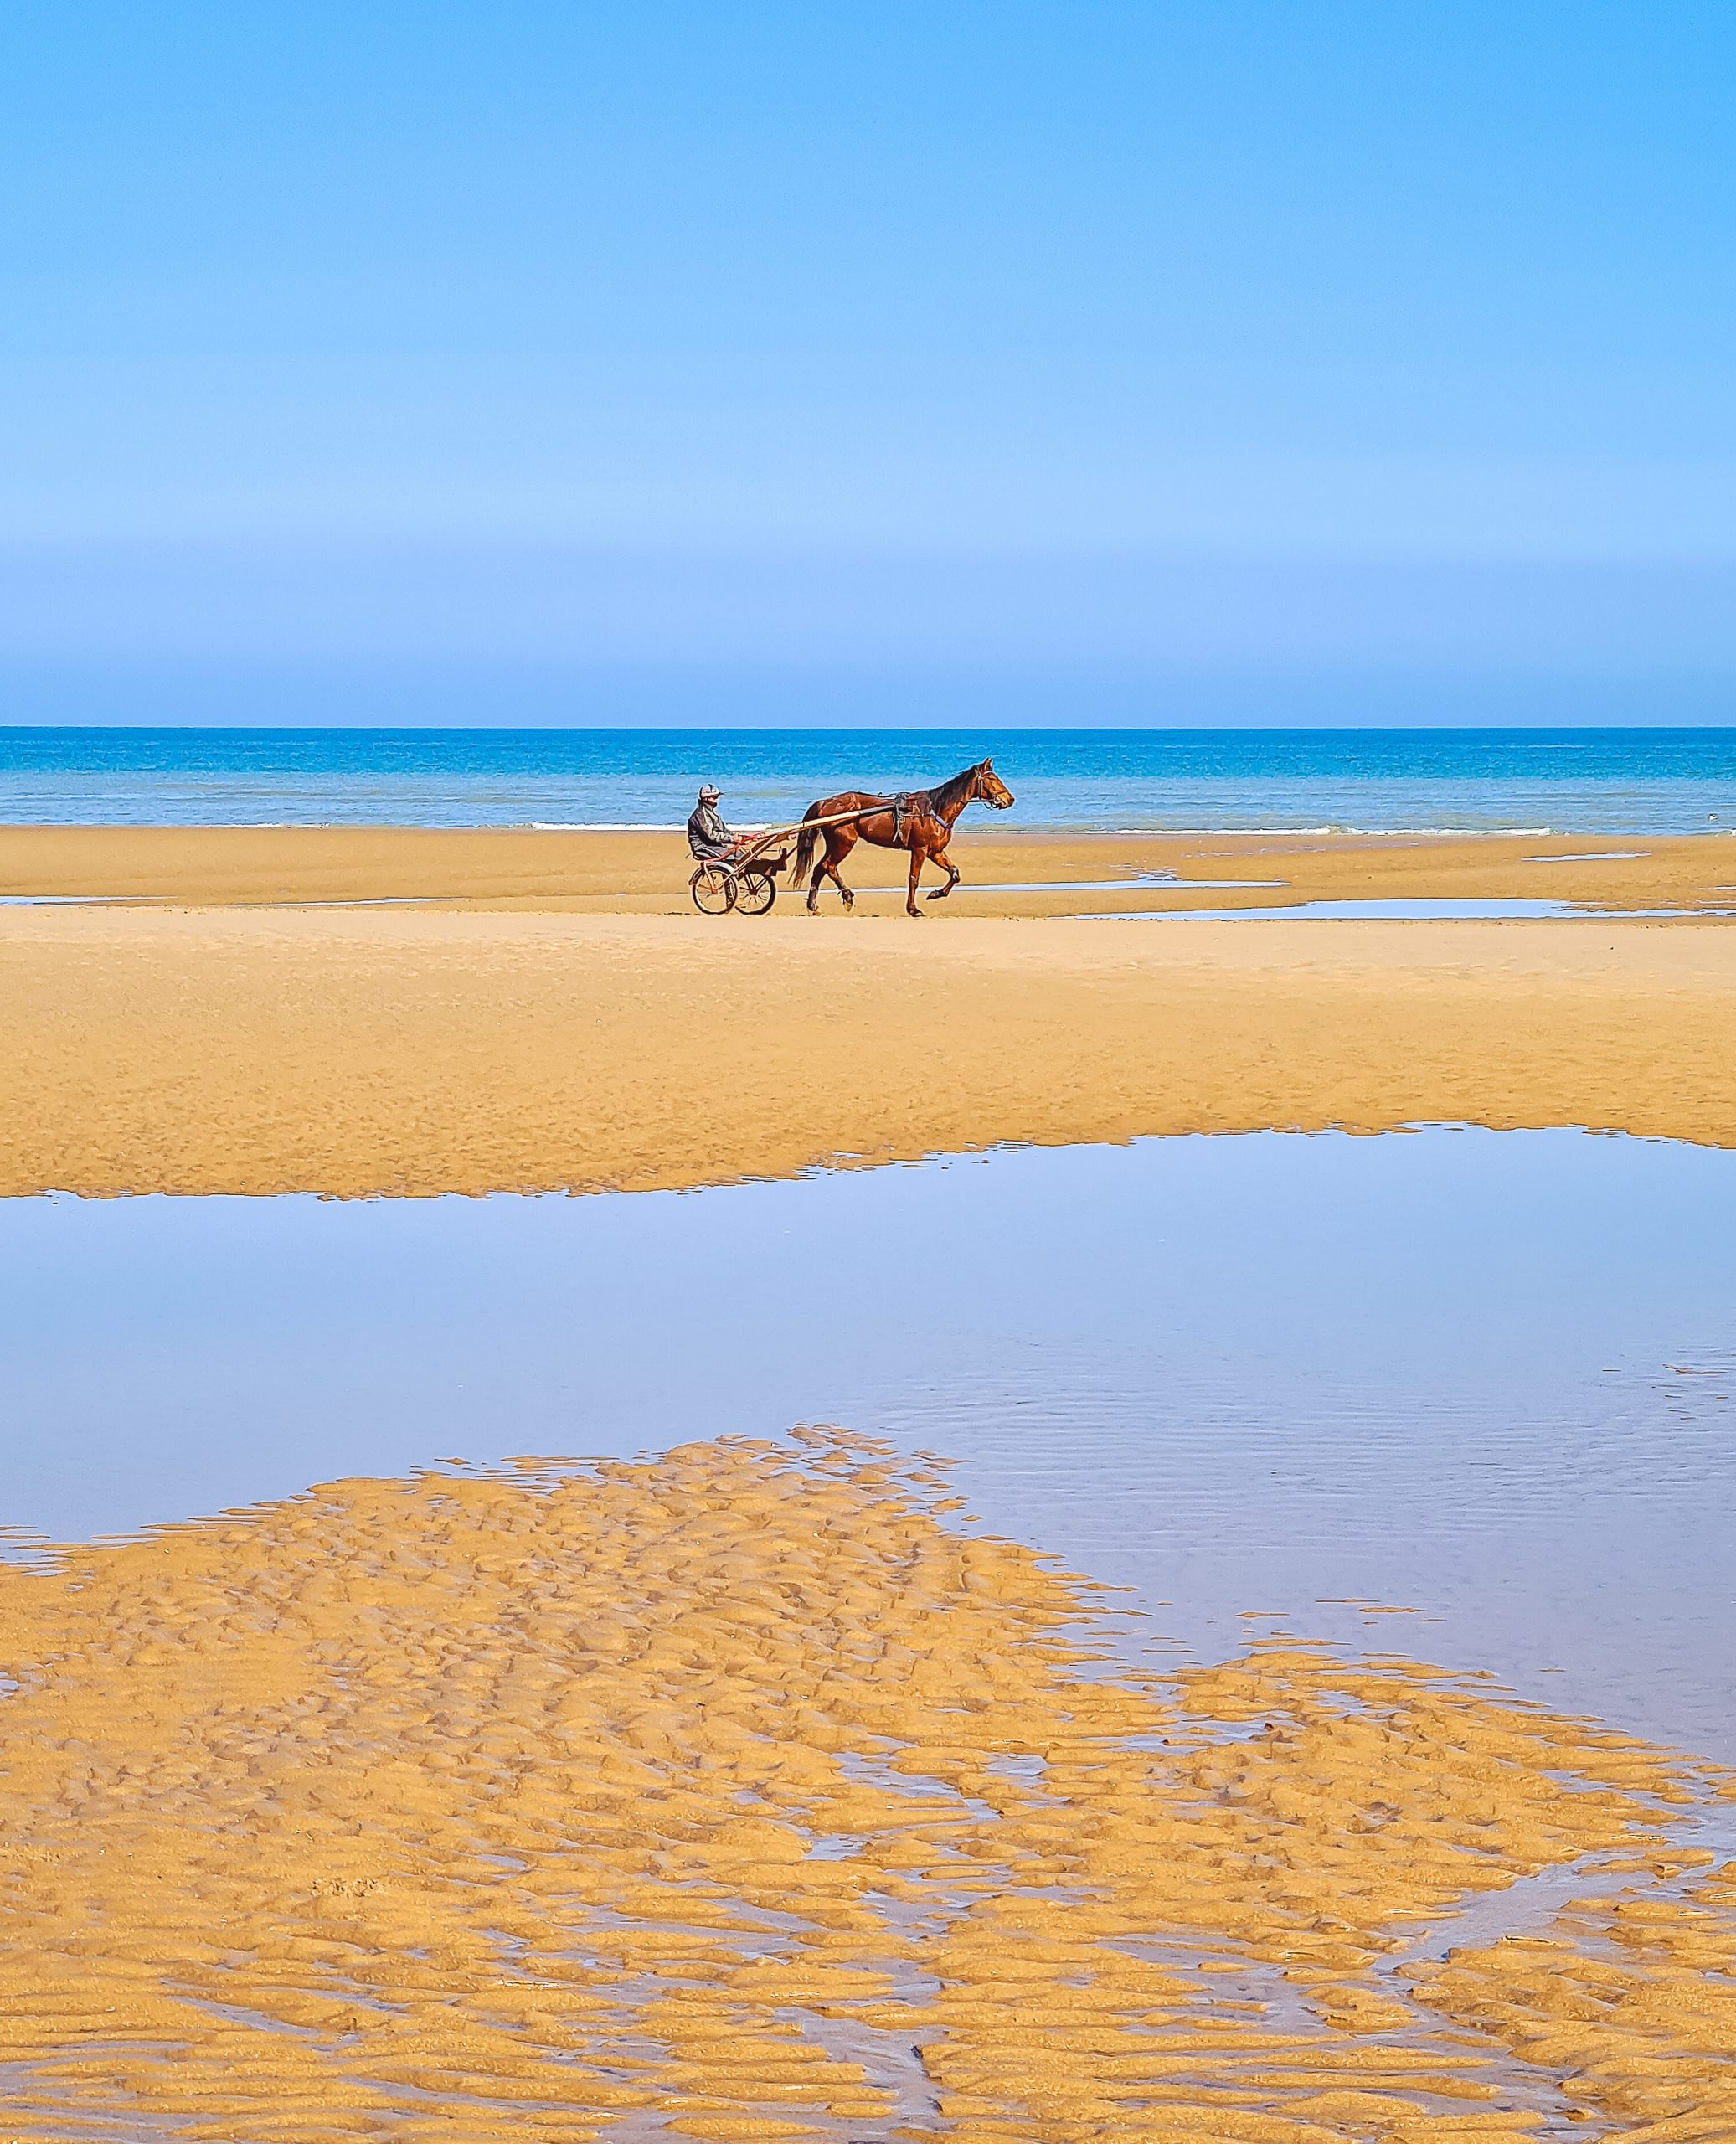 Mer et plage d'Omaha Beach